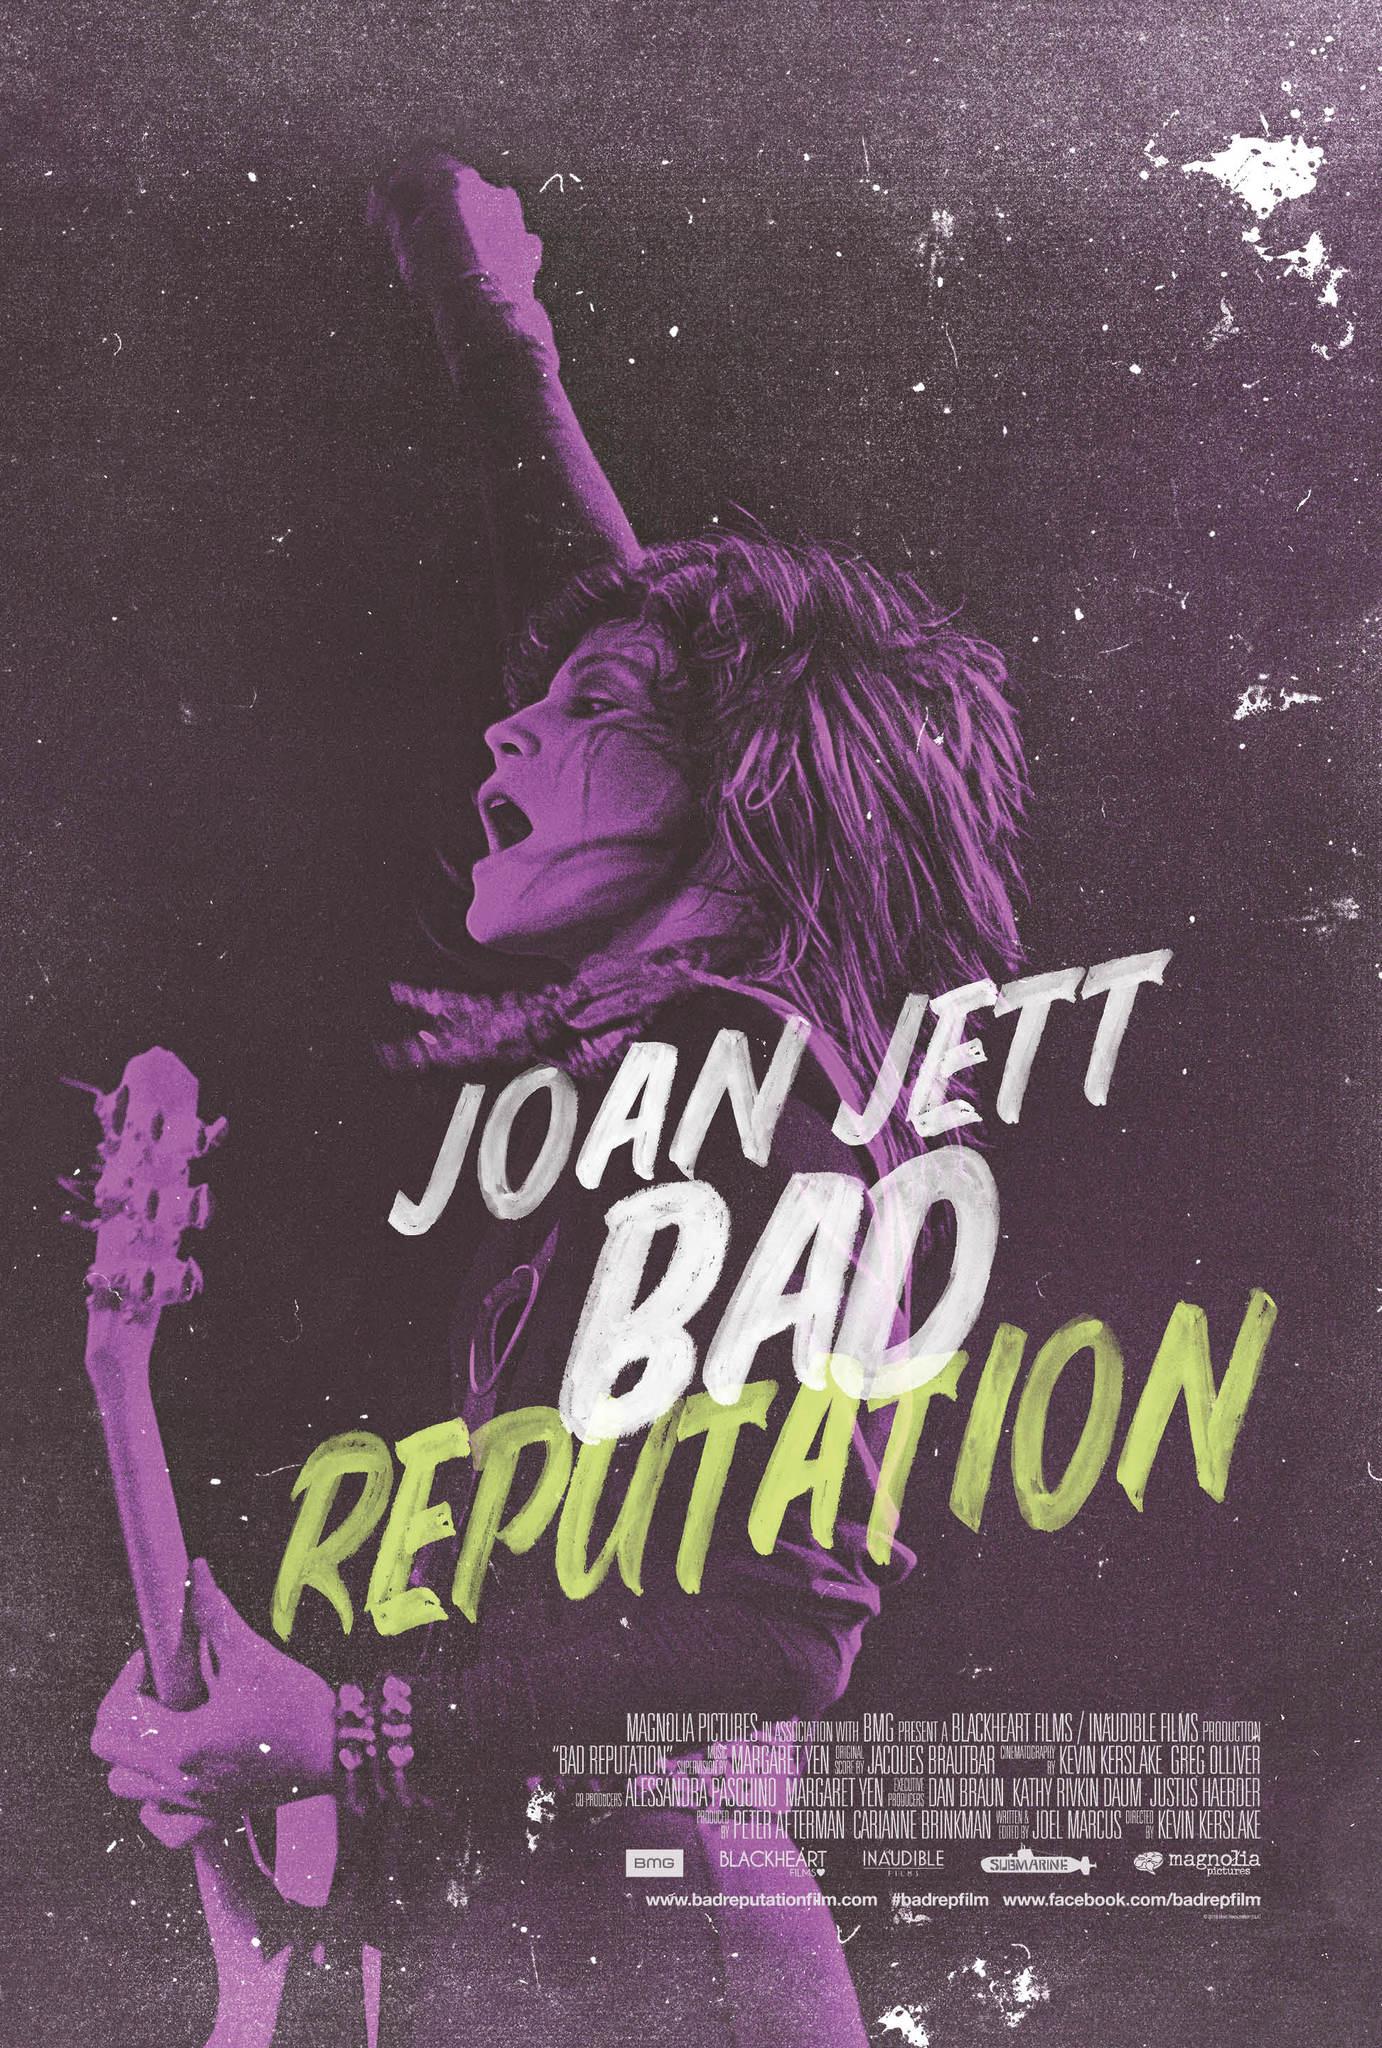 Joan Jett Bad Reputation poster